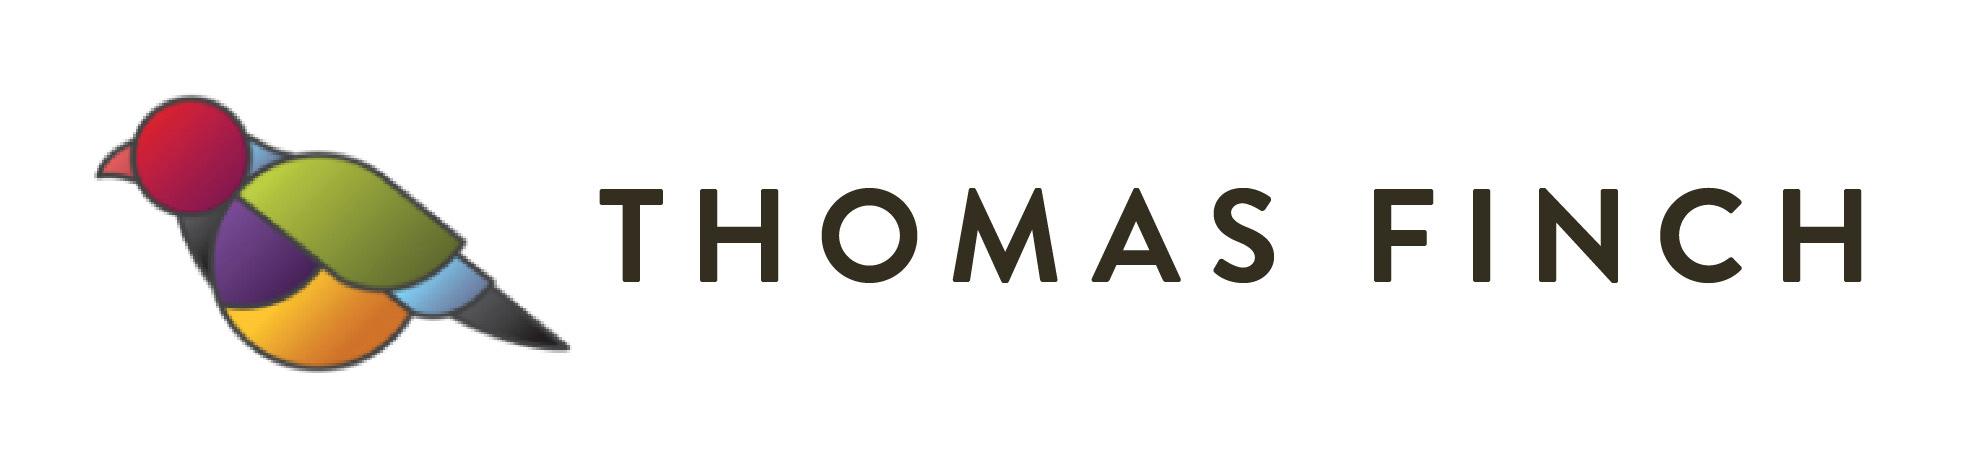 Thomas Finch